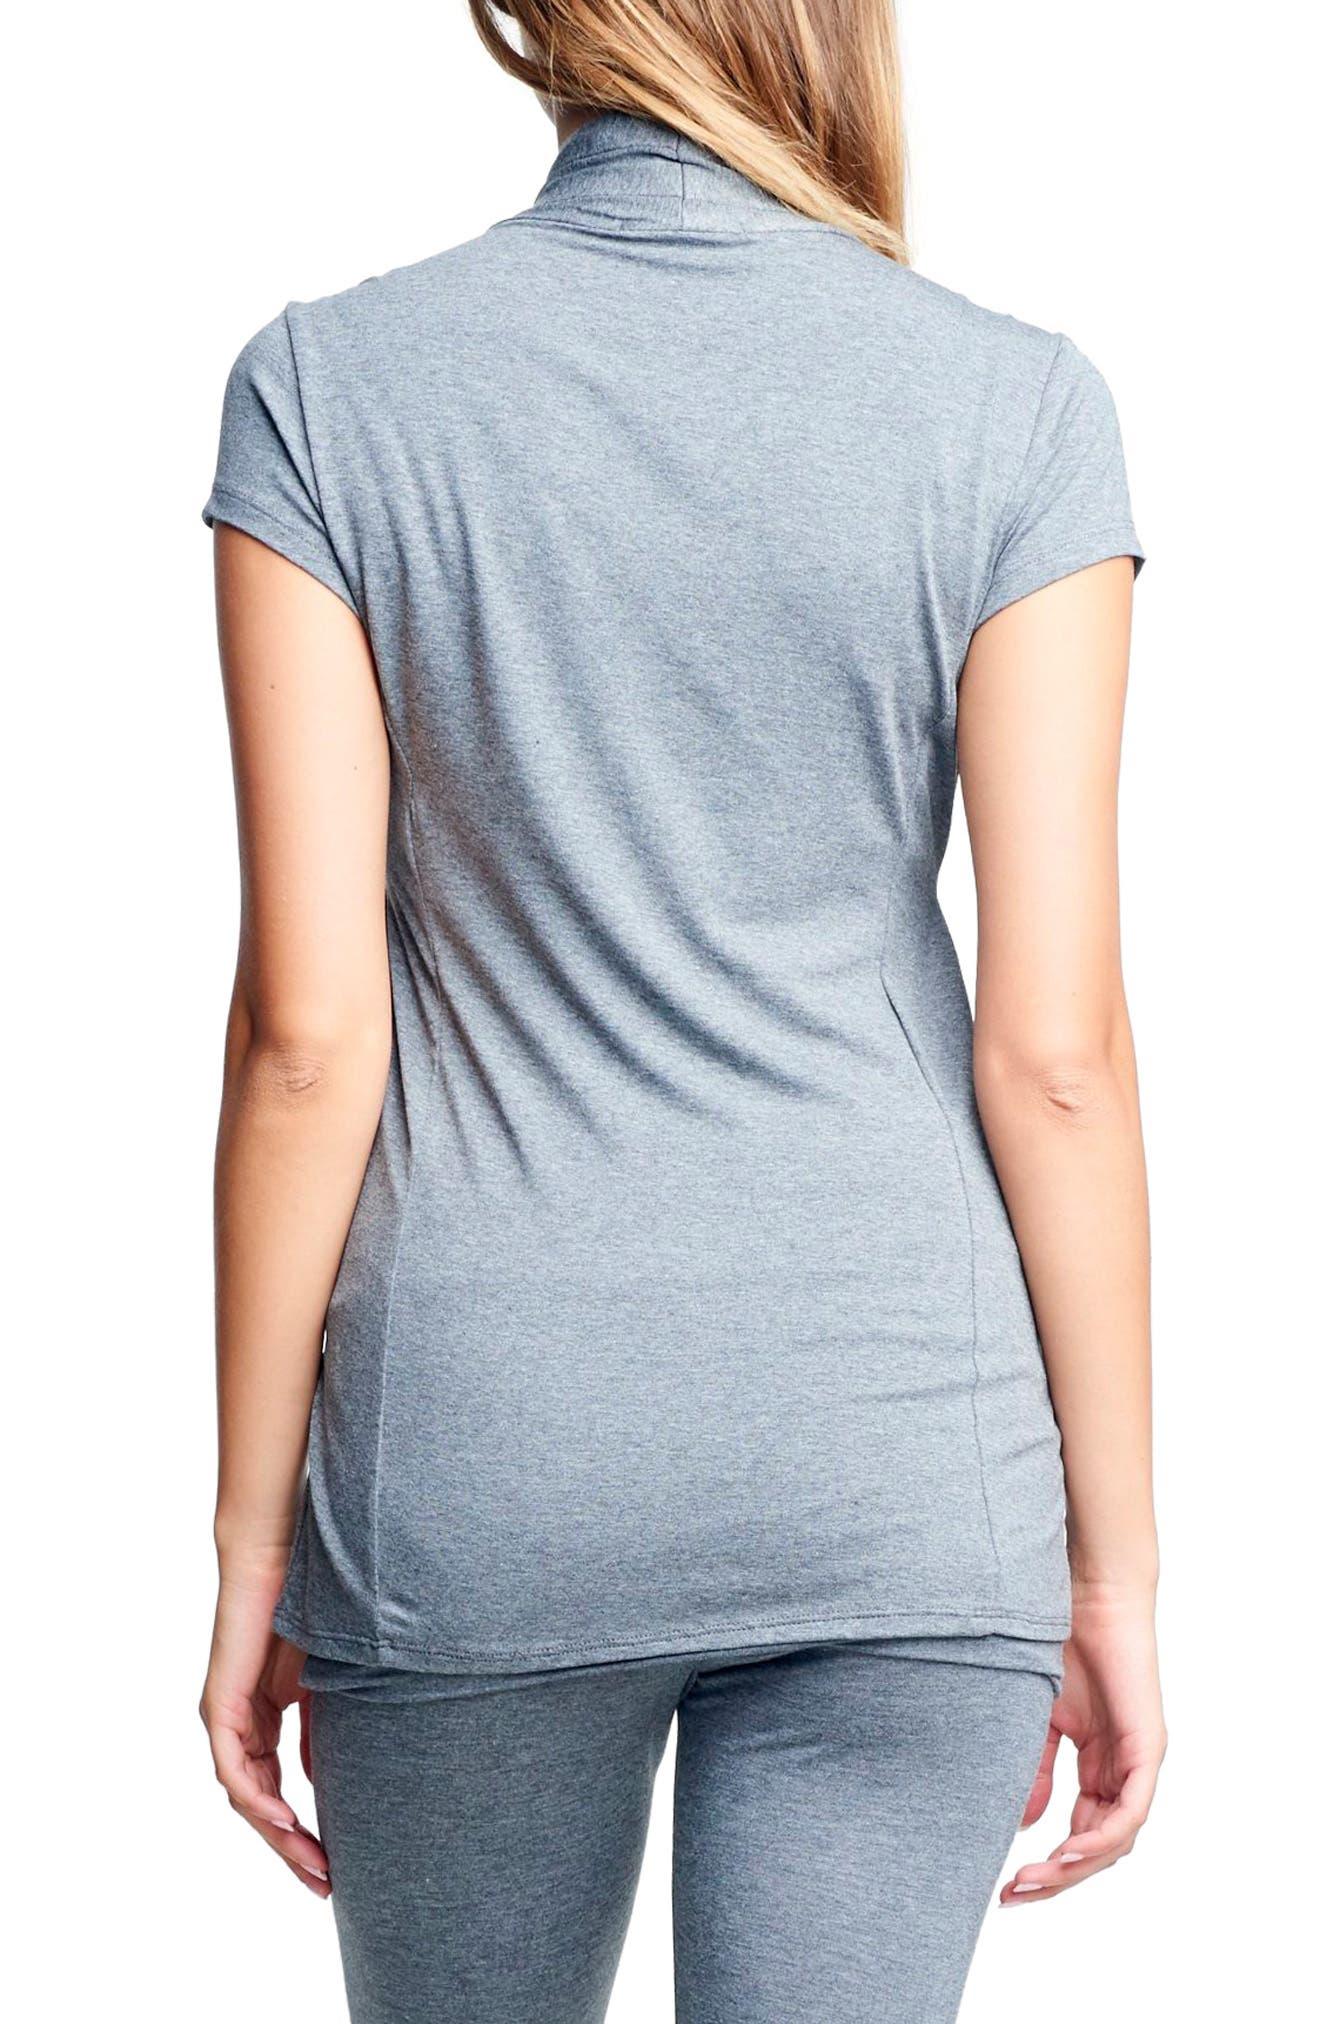 Cross Drape Maternity/Nursing Top,                             Alternate thumbnail 2, color,                             STONE GRAY